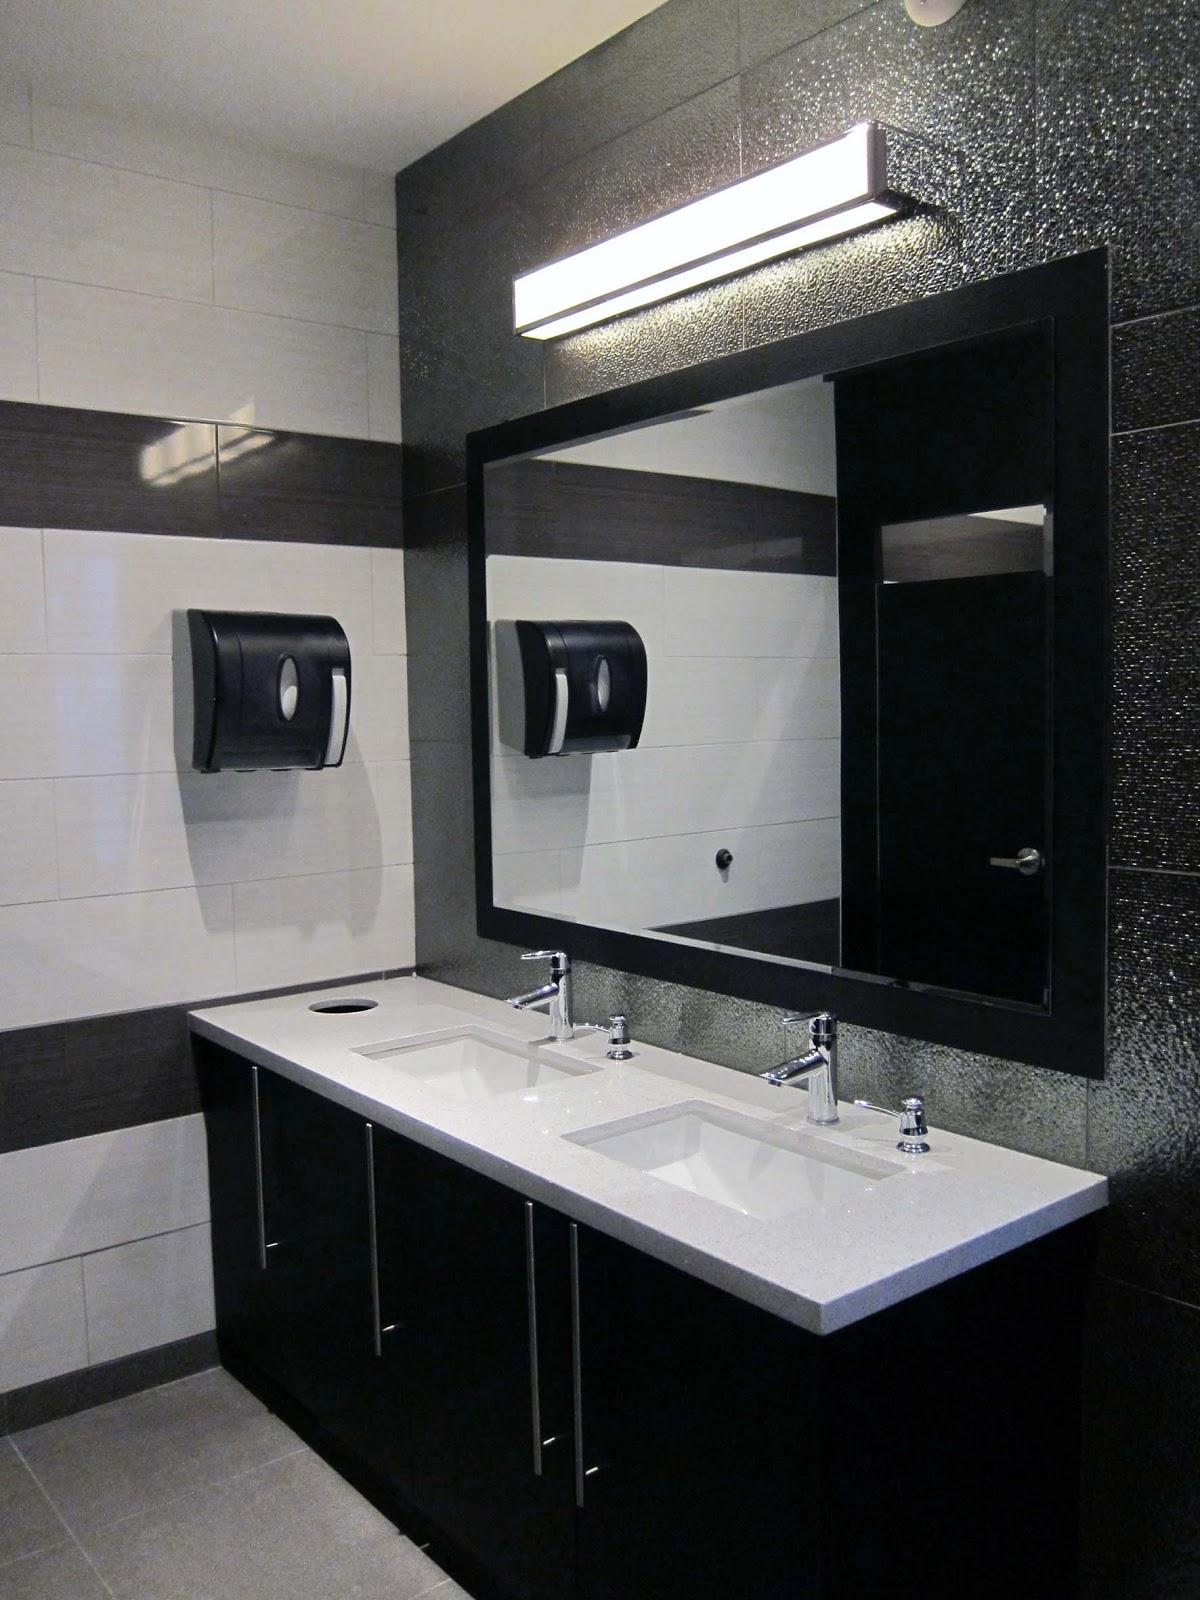 Restaurant Bathroom Stall Design